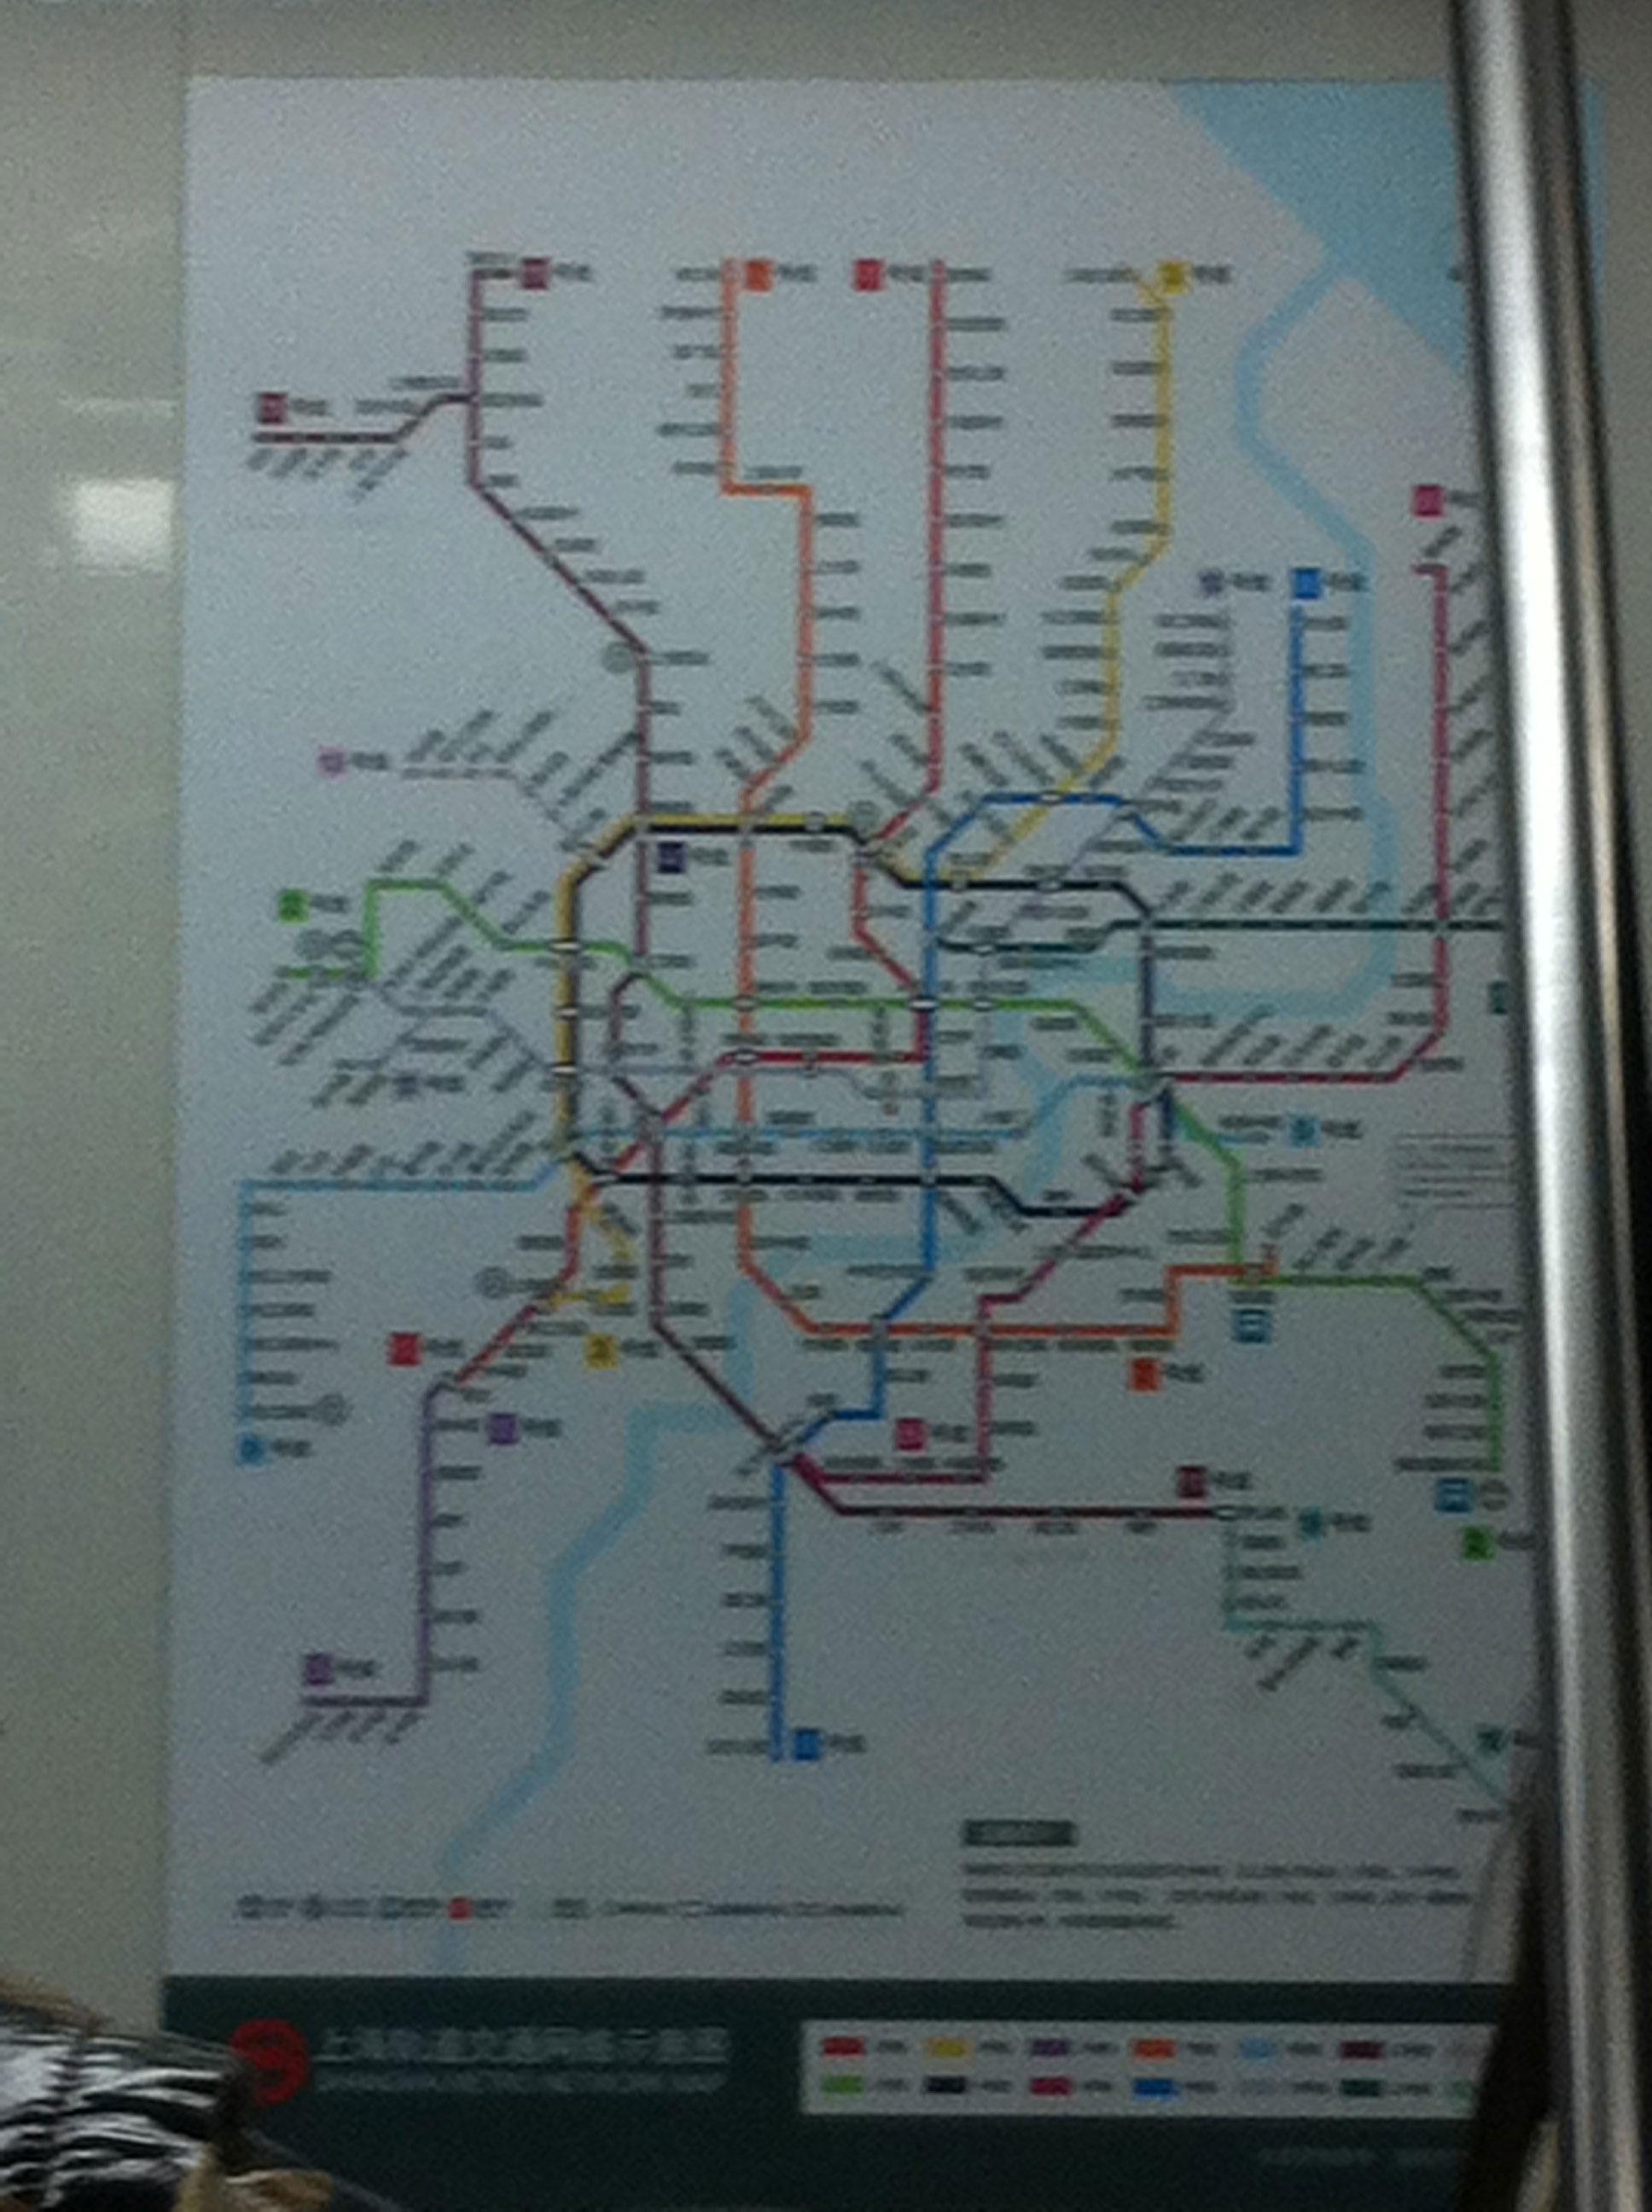 Shanghai Metro System